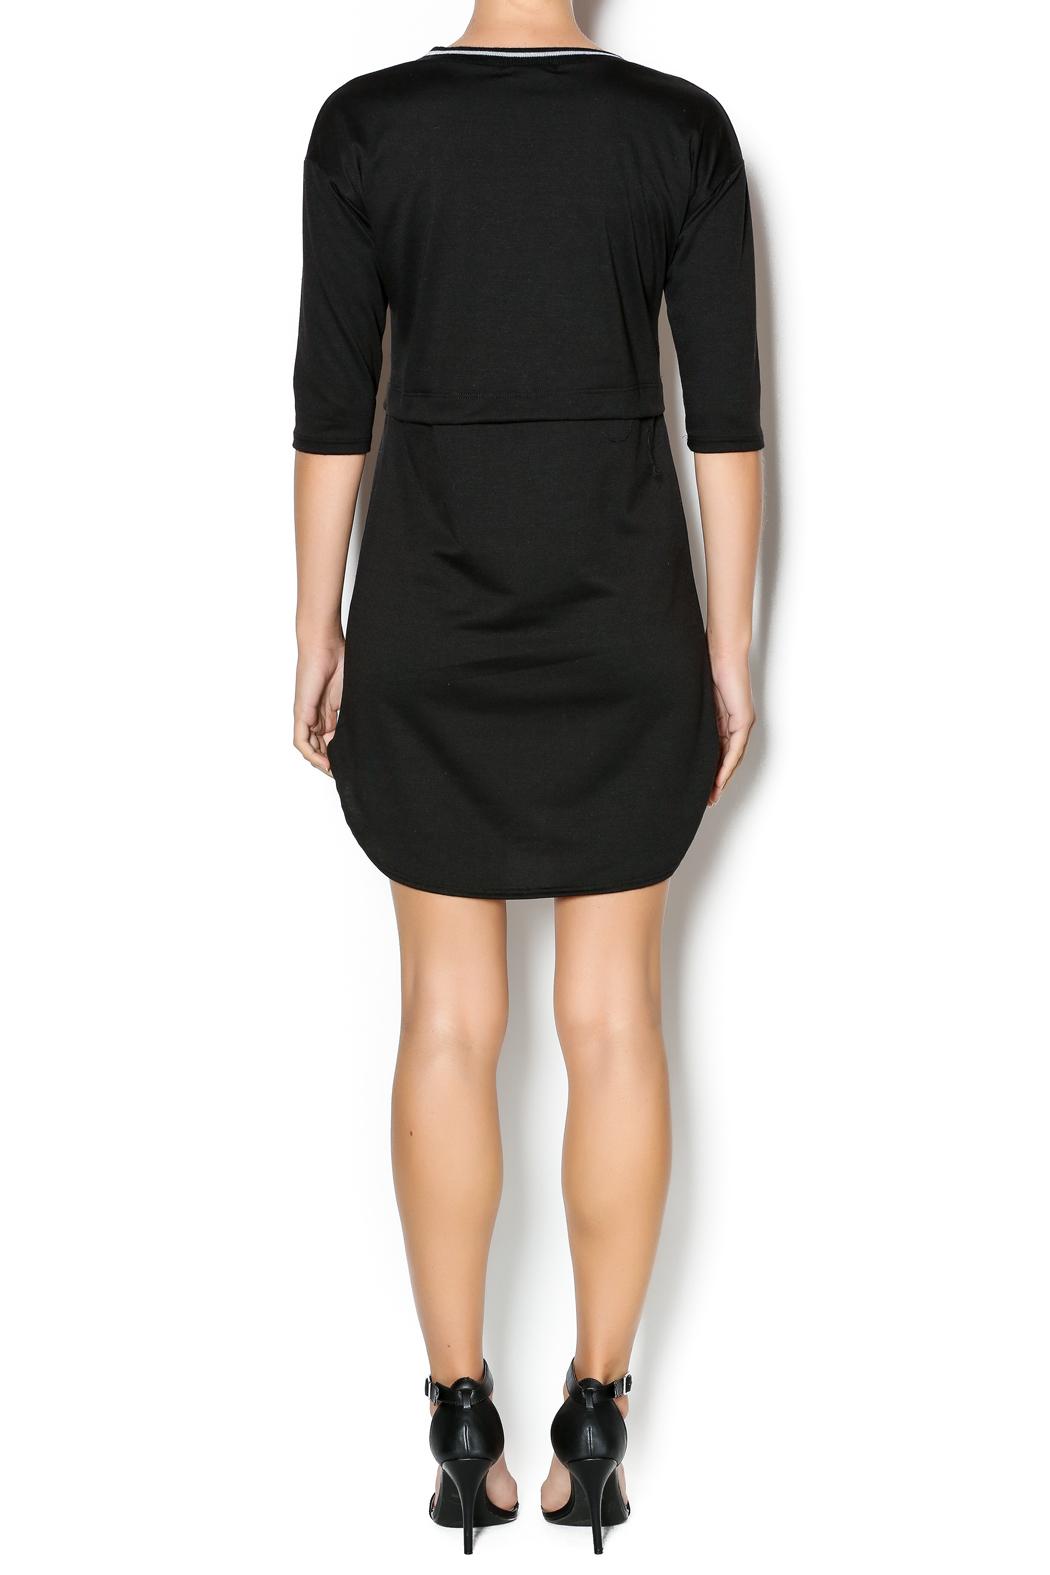 casual black dress photo - 1